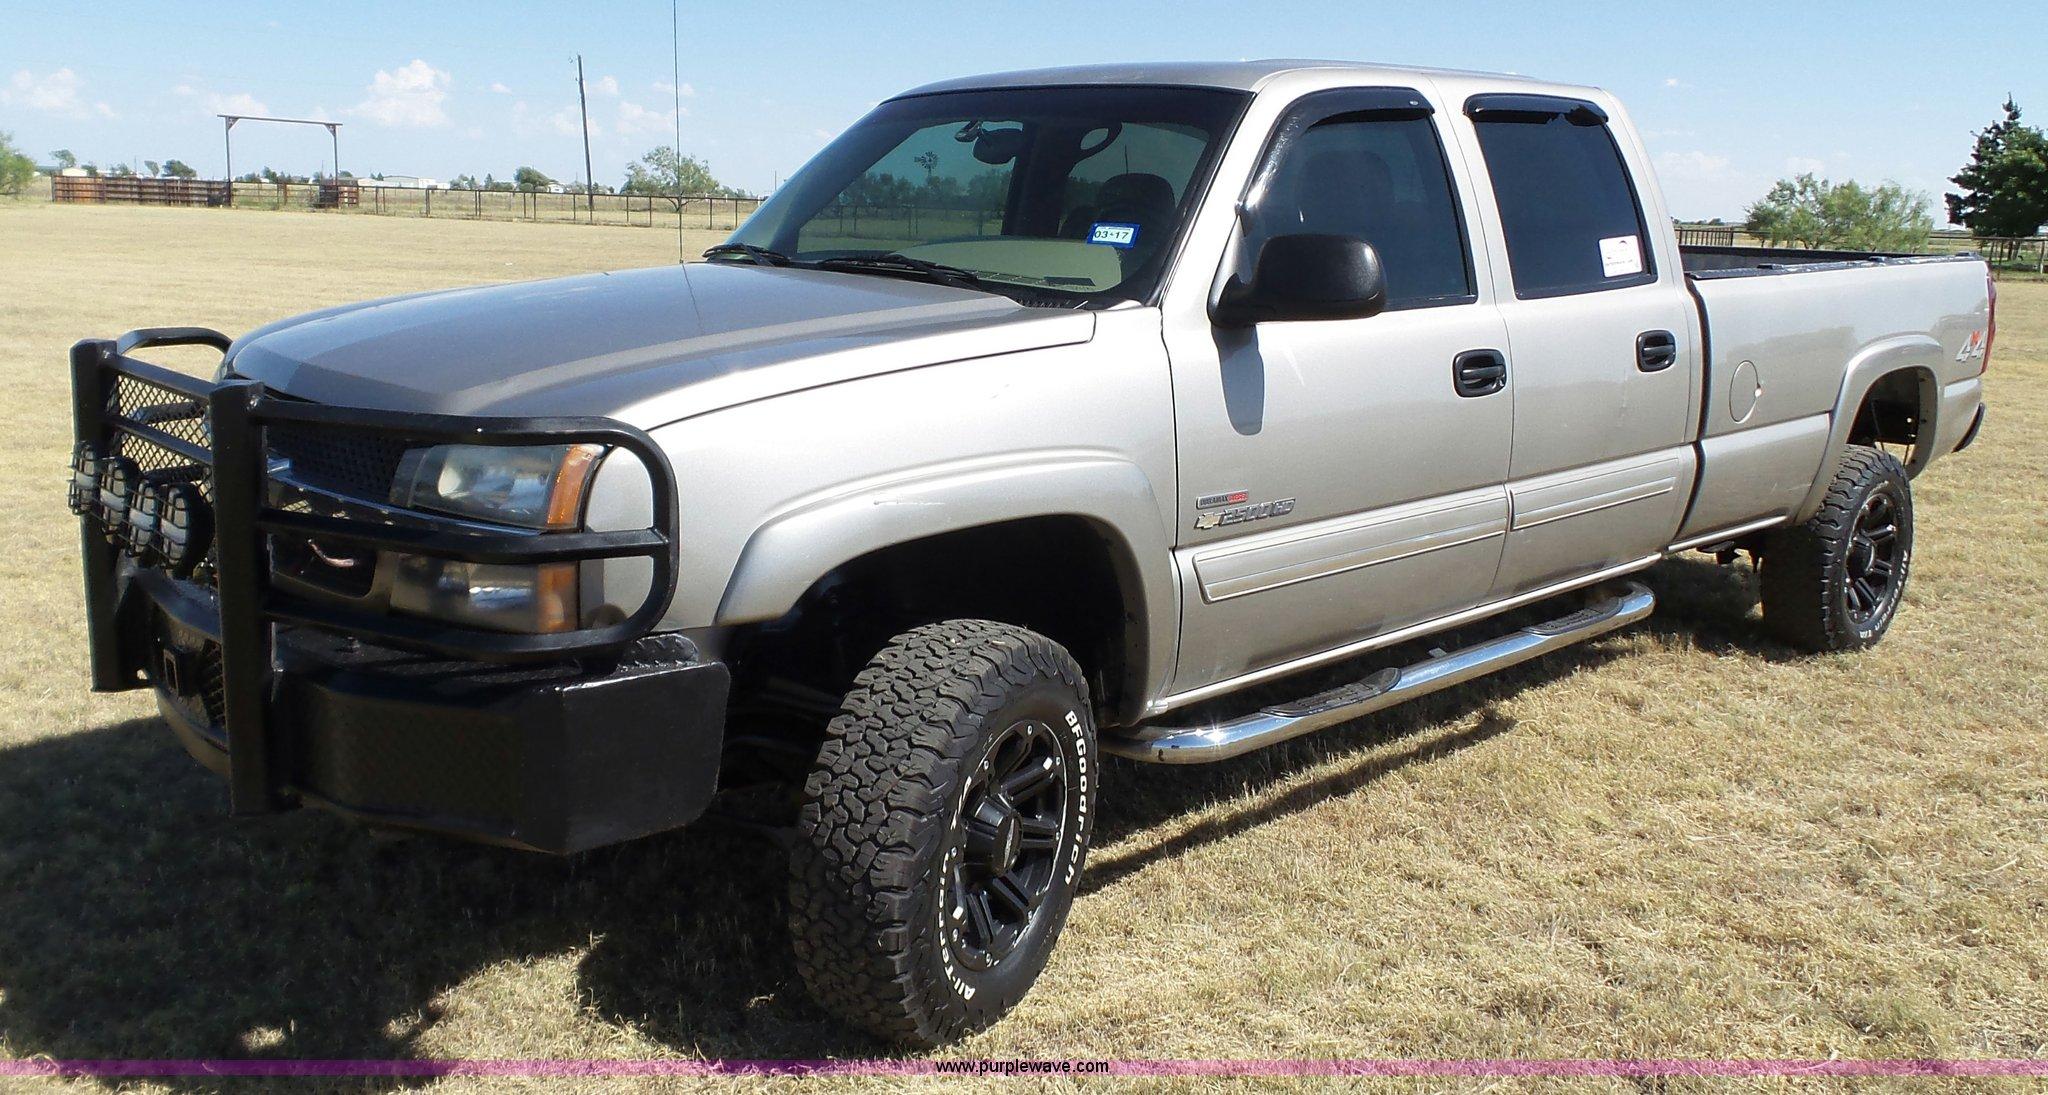 truck item for auction crew pickup image chevrolet silverado cab